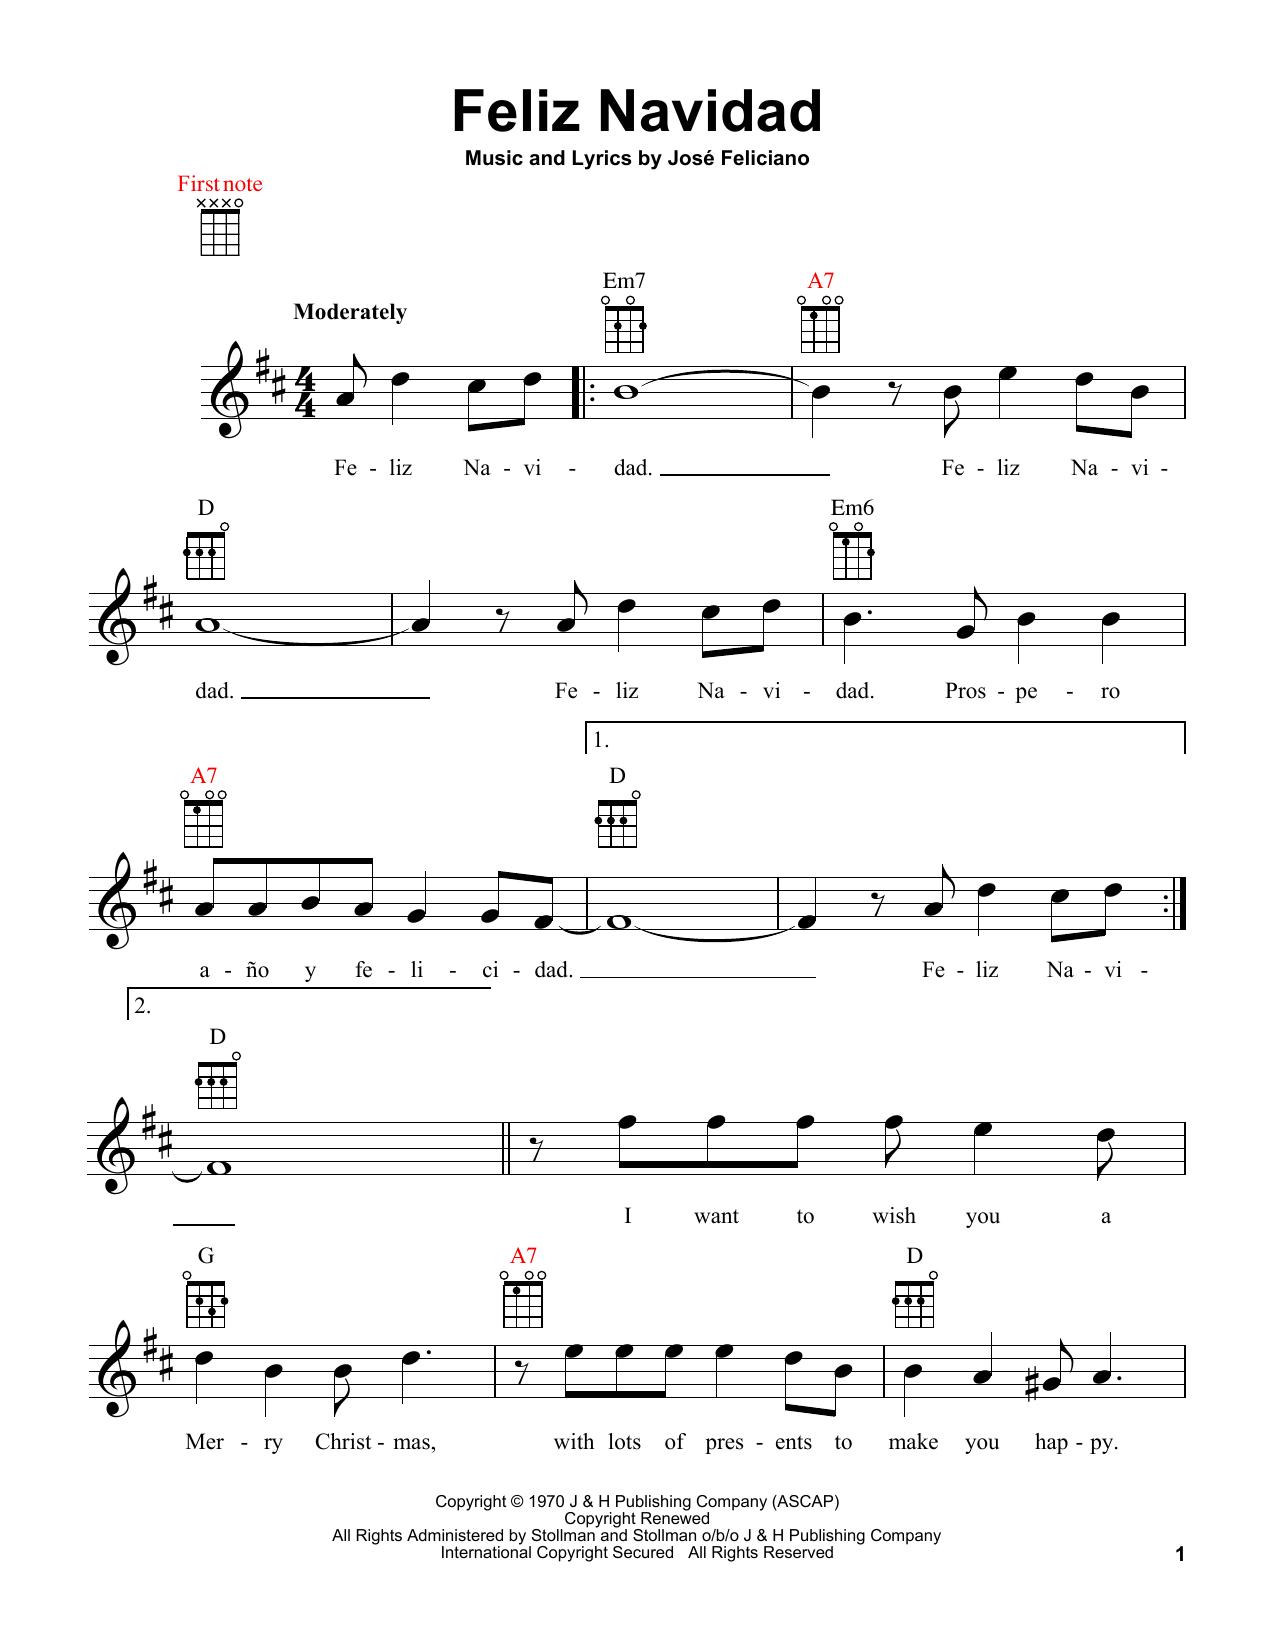 feliz navidad ukulele print sheet music now feliz navidad ukulele print sheet music now